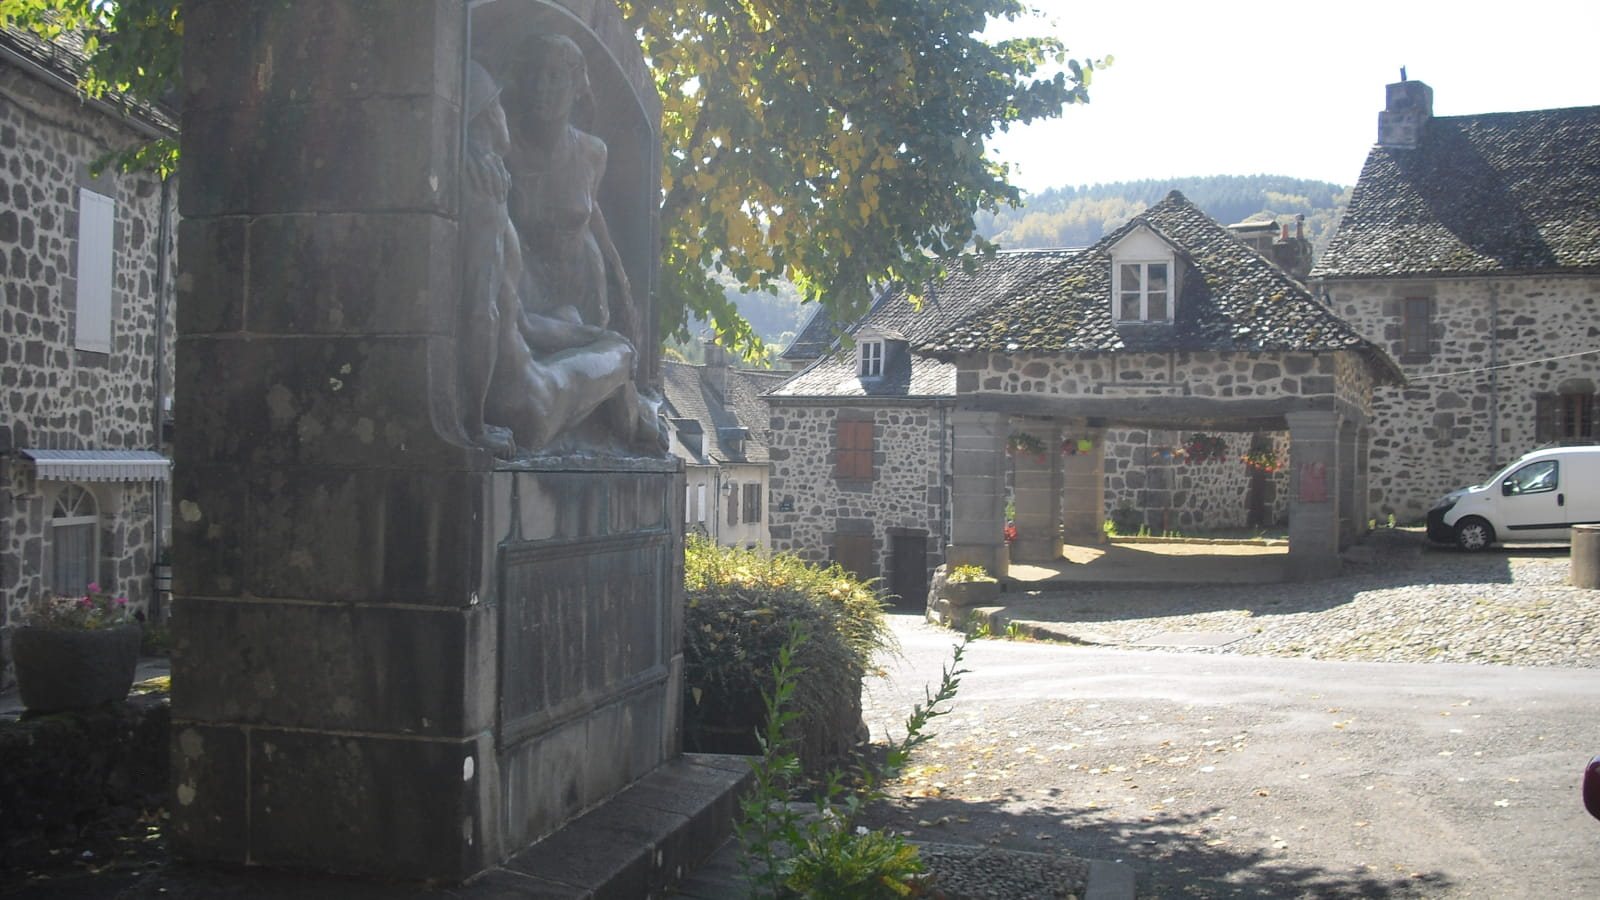 Saint-Martin-Valmeroux